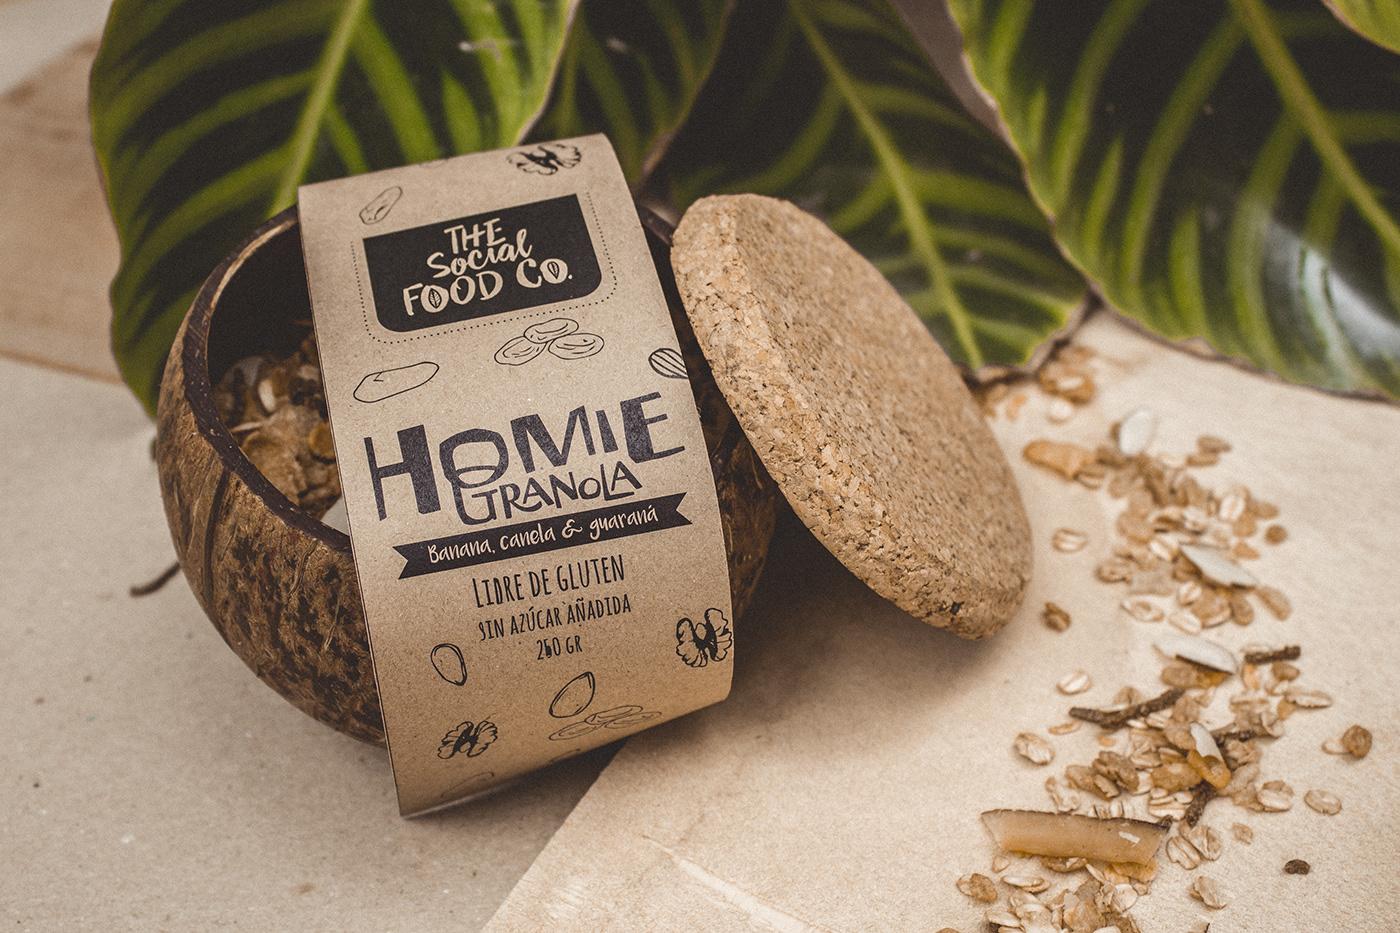 empaque granola Coco acai producto Packaging Coconut product eco ecologico